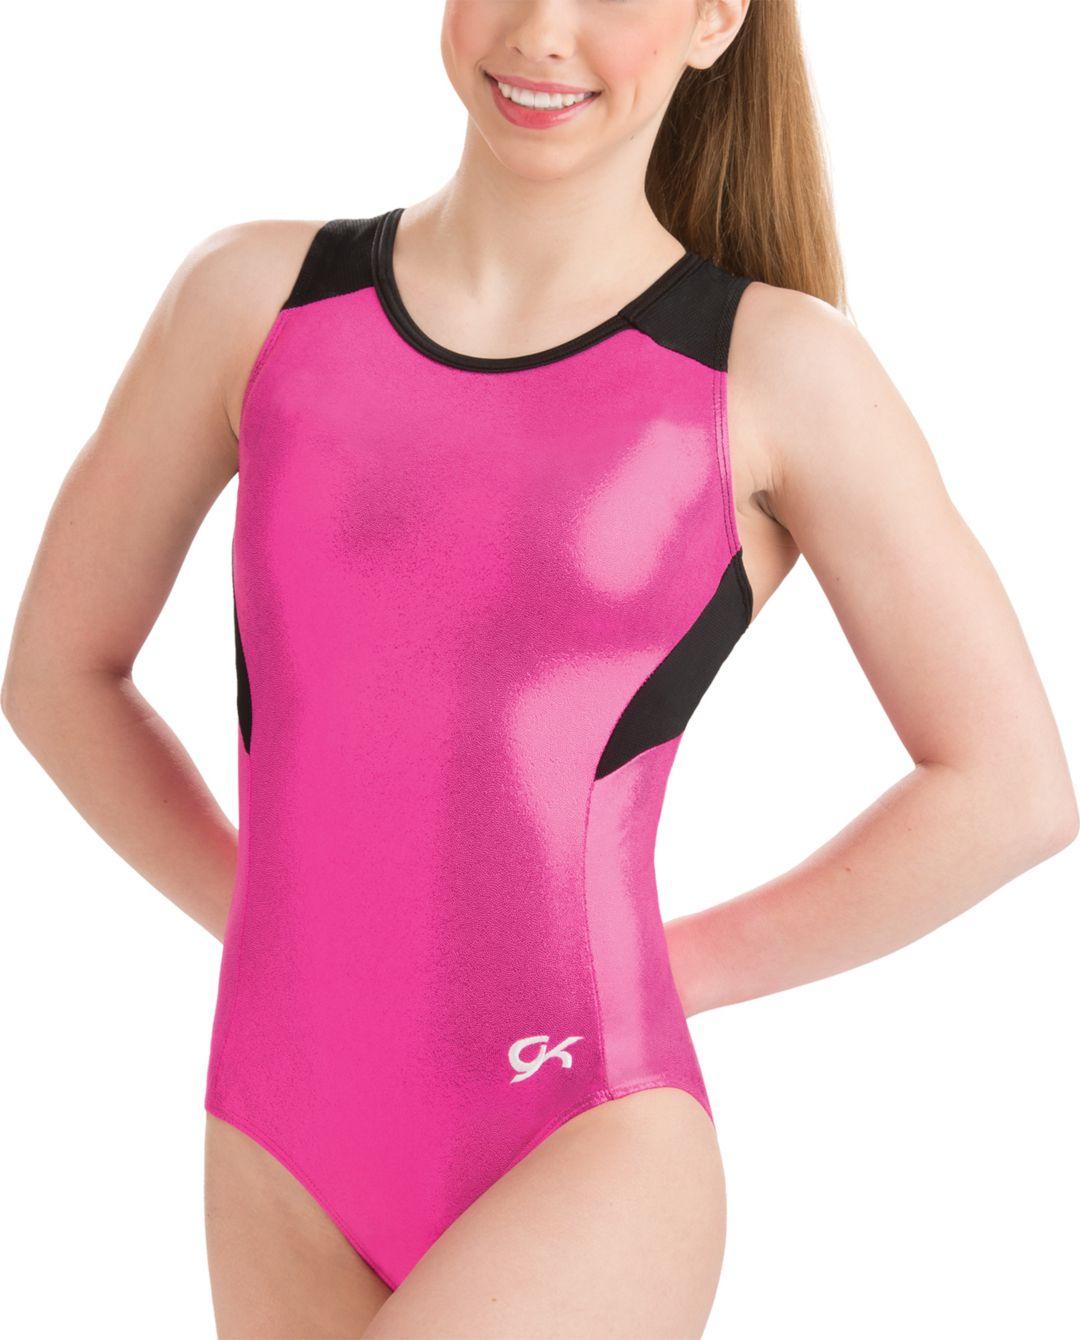 251990363a57 GK Elite Women's Mesh Racerback Gymnastics Leotard | DICK'S Sporting ...